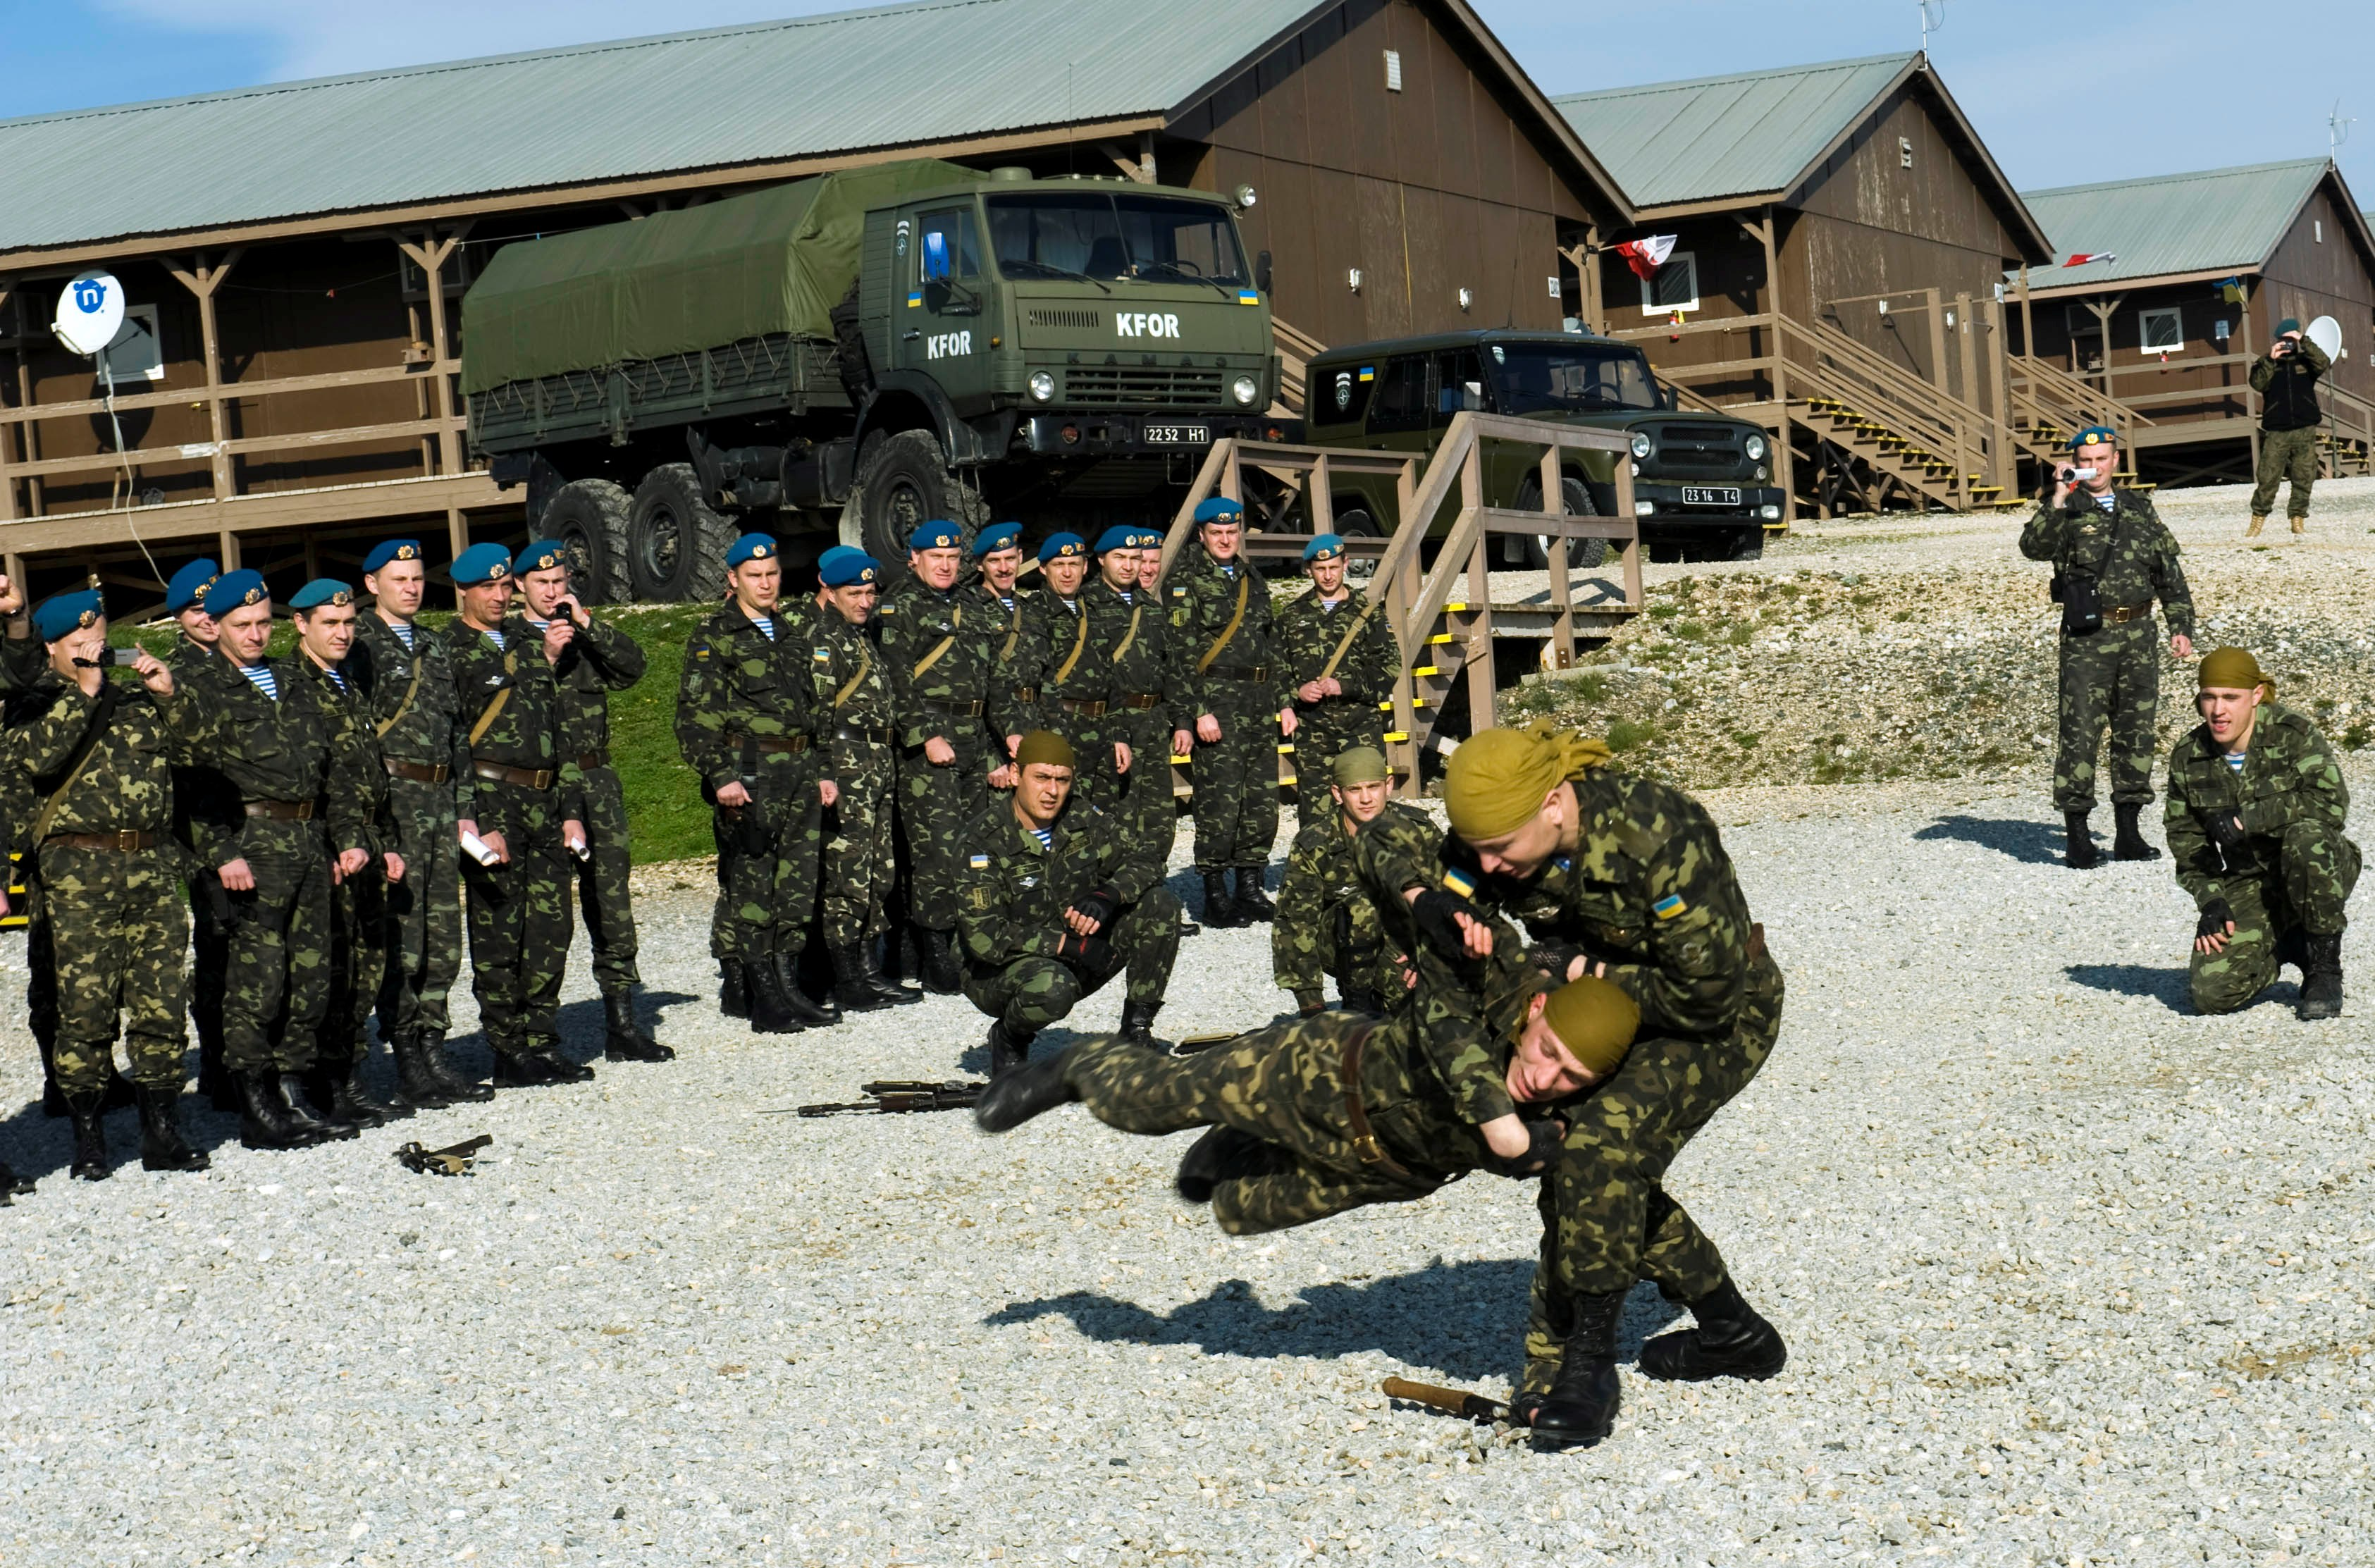 File:Martial arts demonstration, Ukrainian military jpg